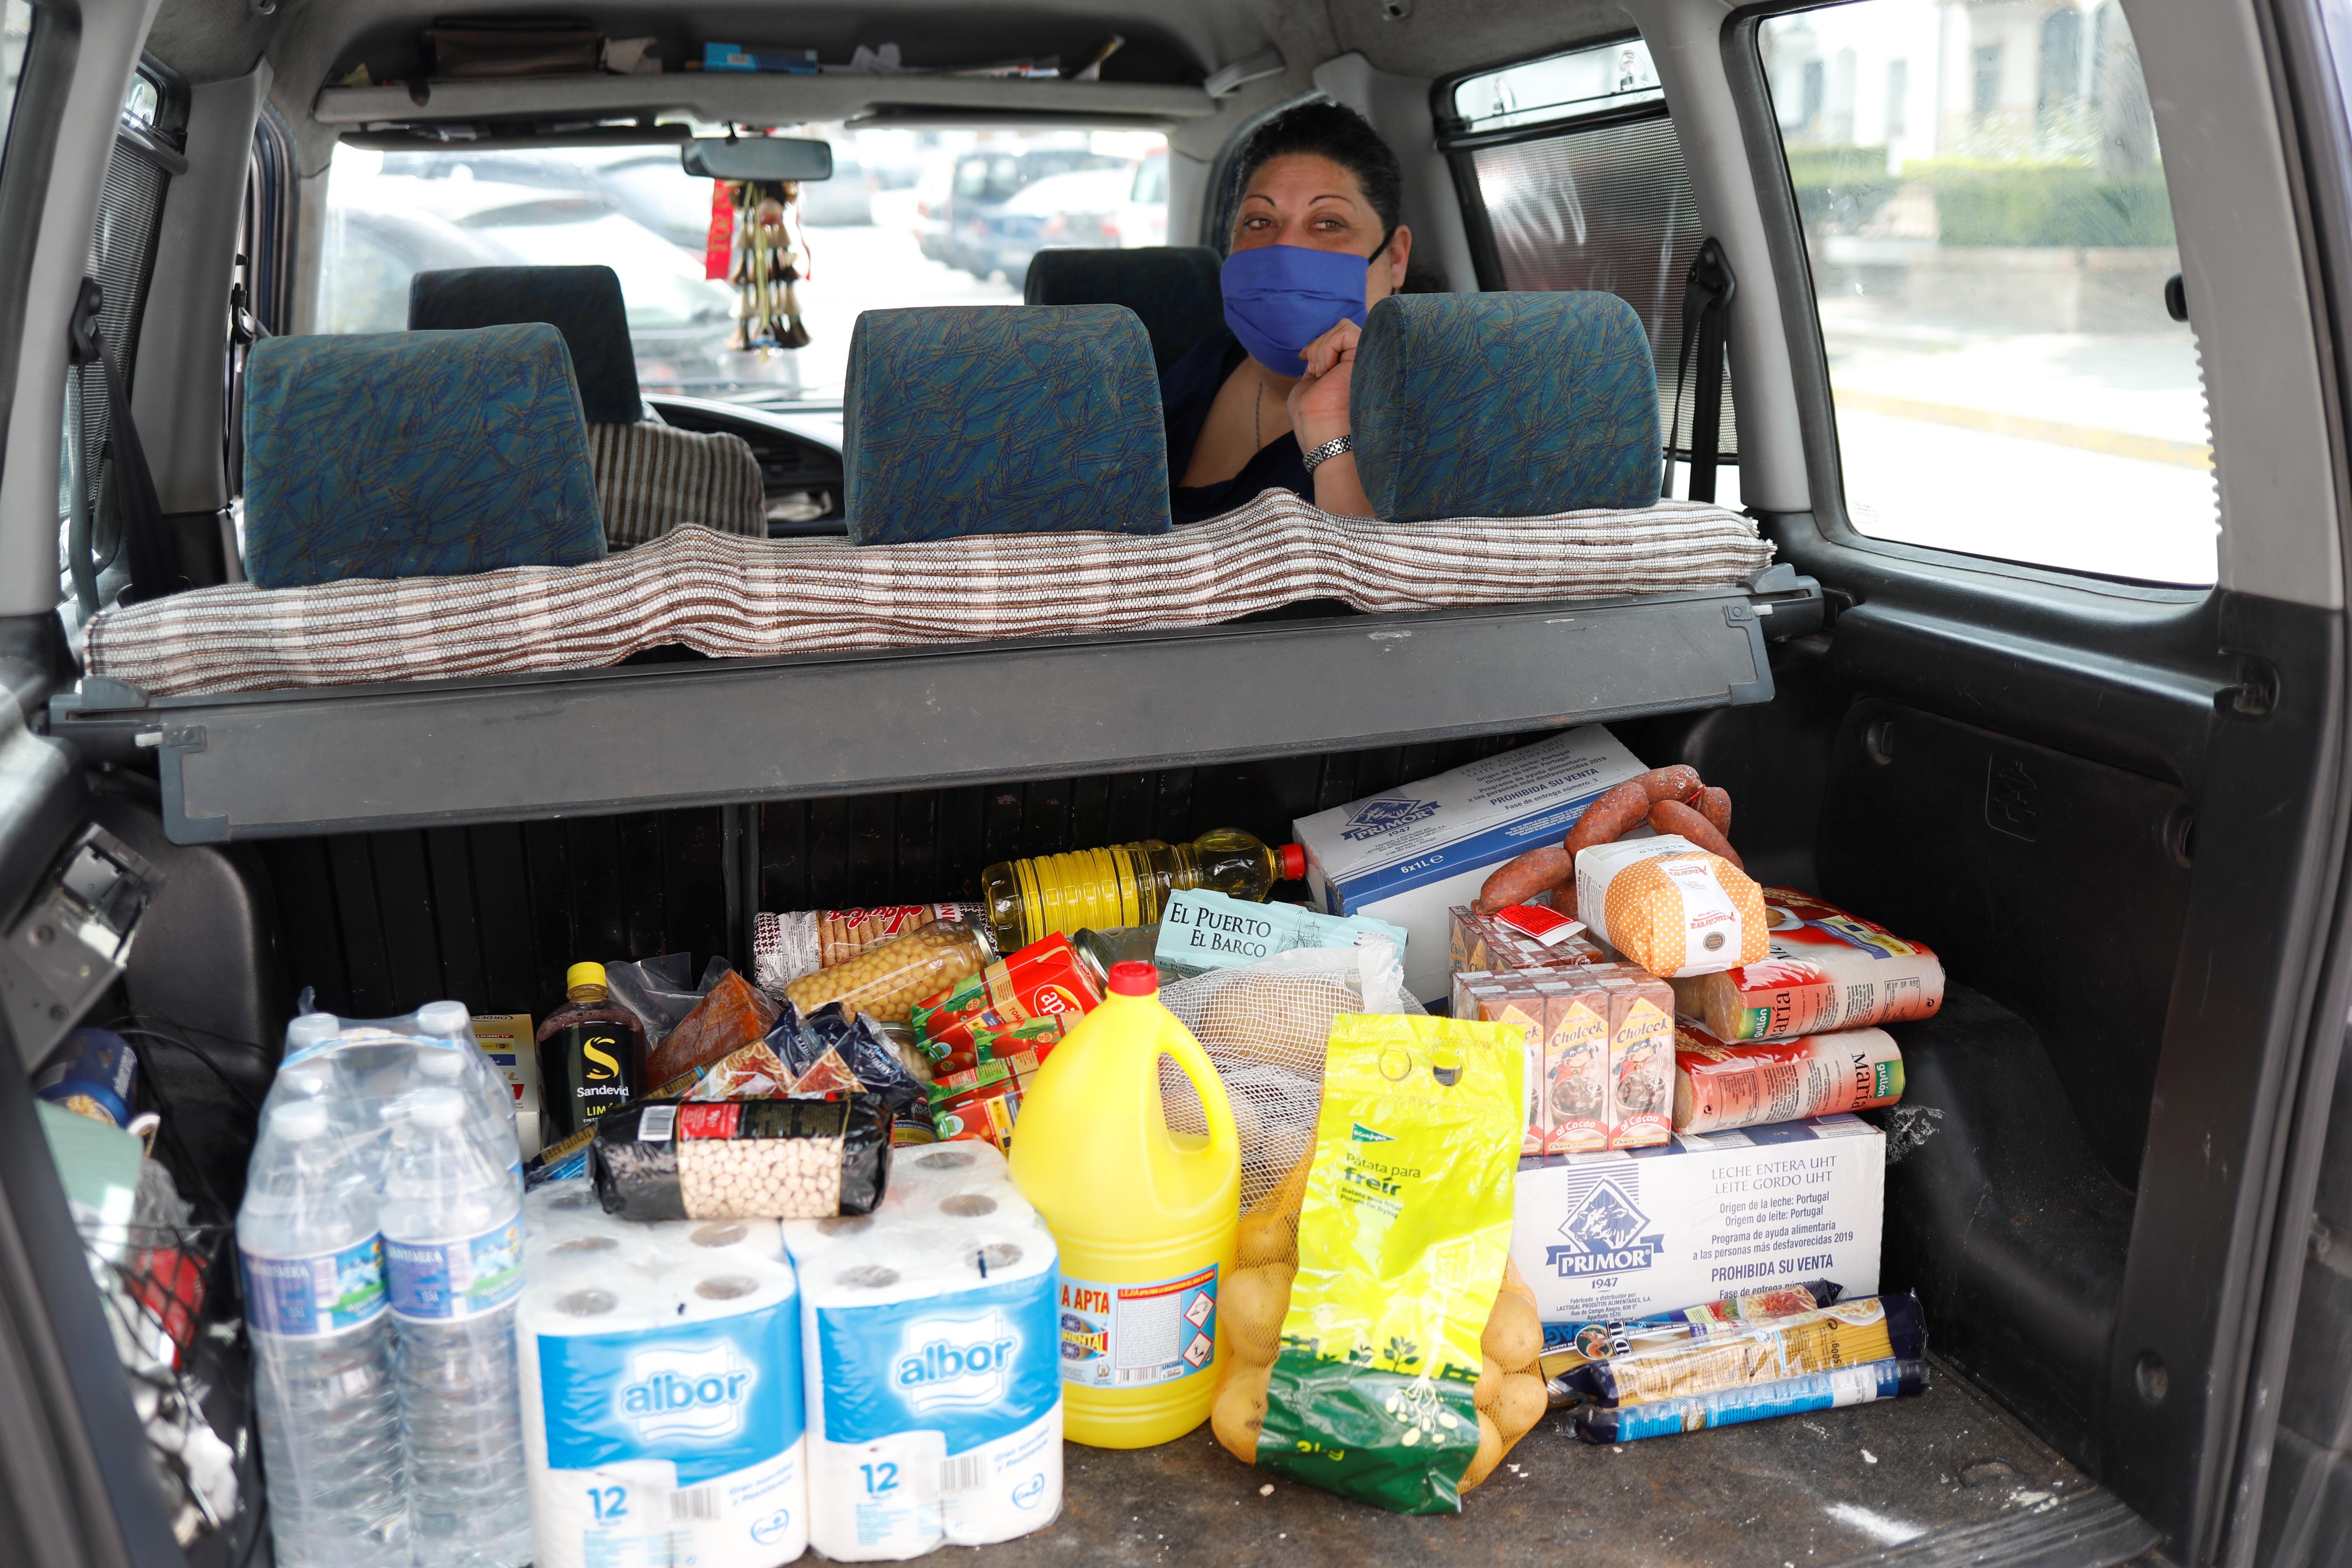 Food waste sustainability COVID-19 coronavirus